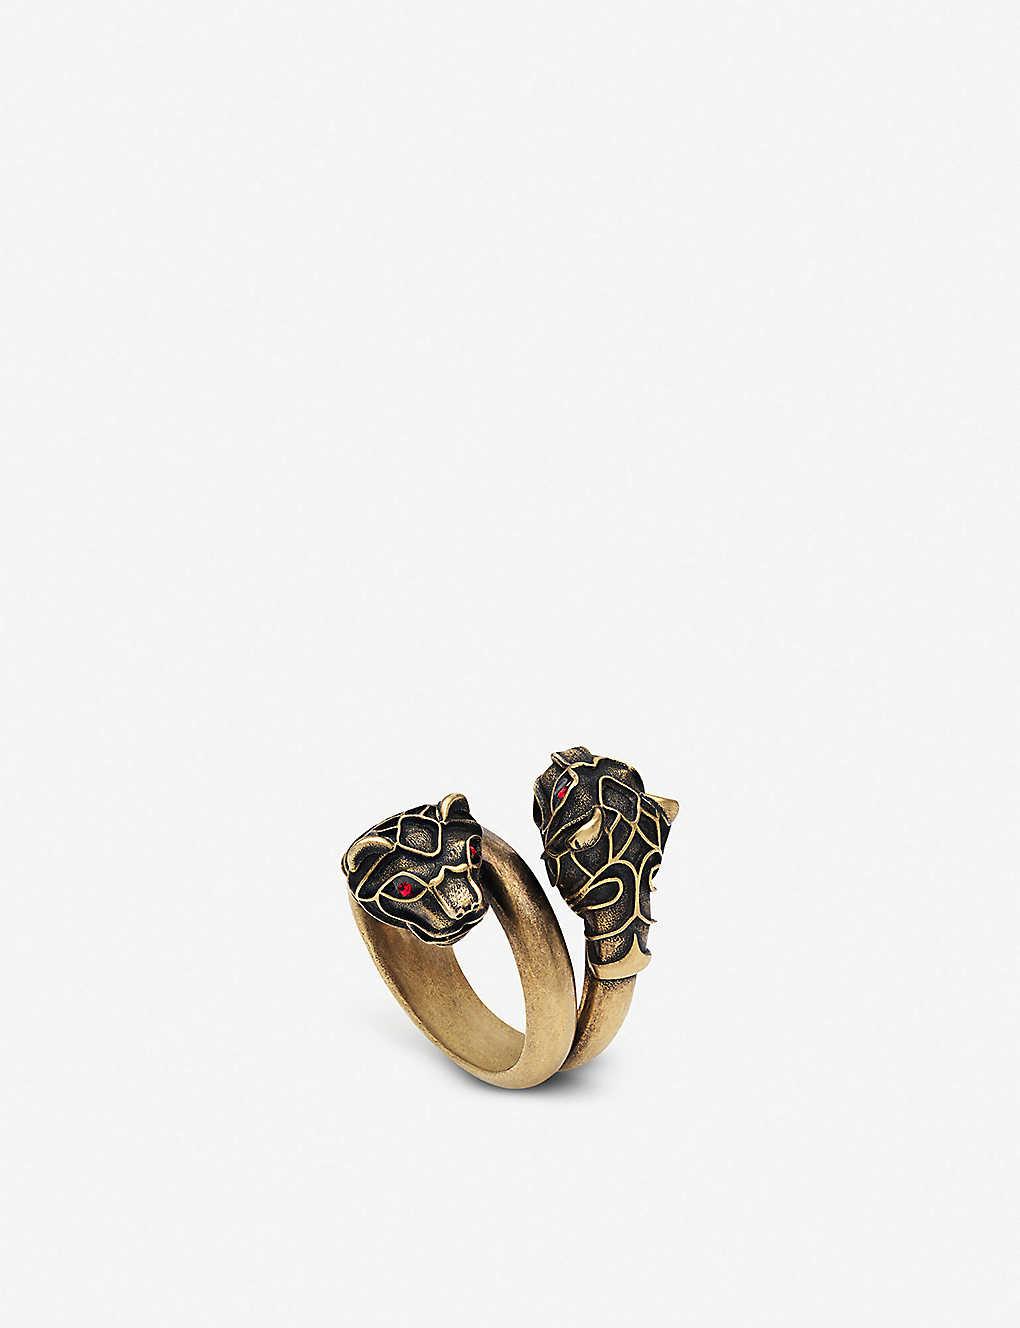 7b0adc38de3 GUCCI - Tiger head Swarovski crystal metal wrap ring